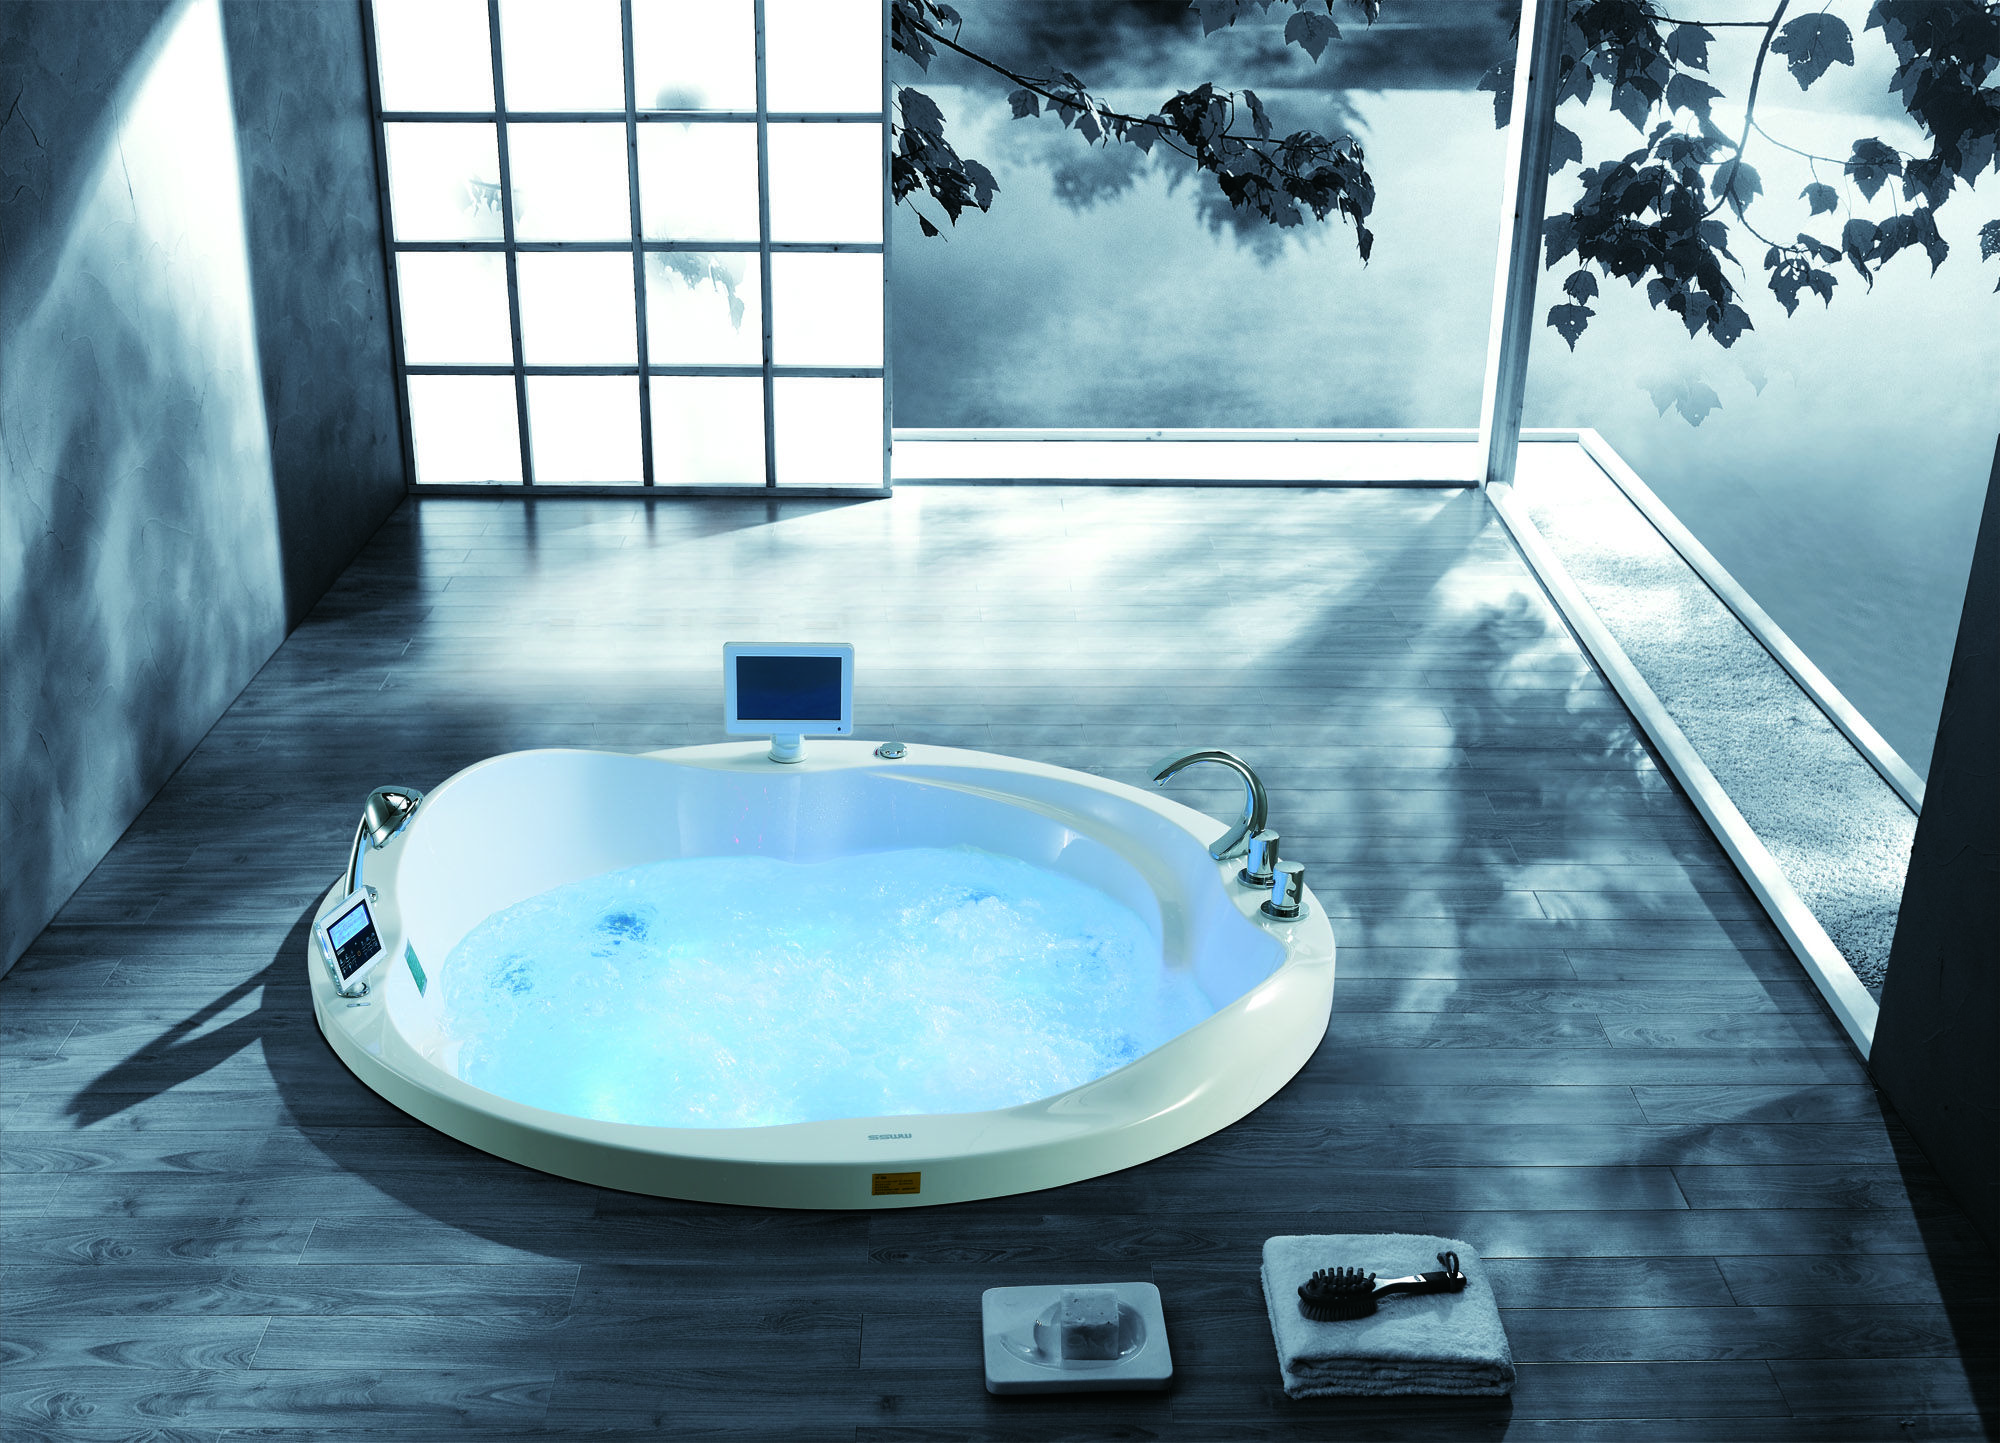 Beautiful Where To Buy Bathtubs Gift - Bathtub Ideas - dilata.info